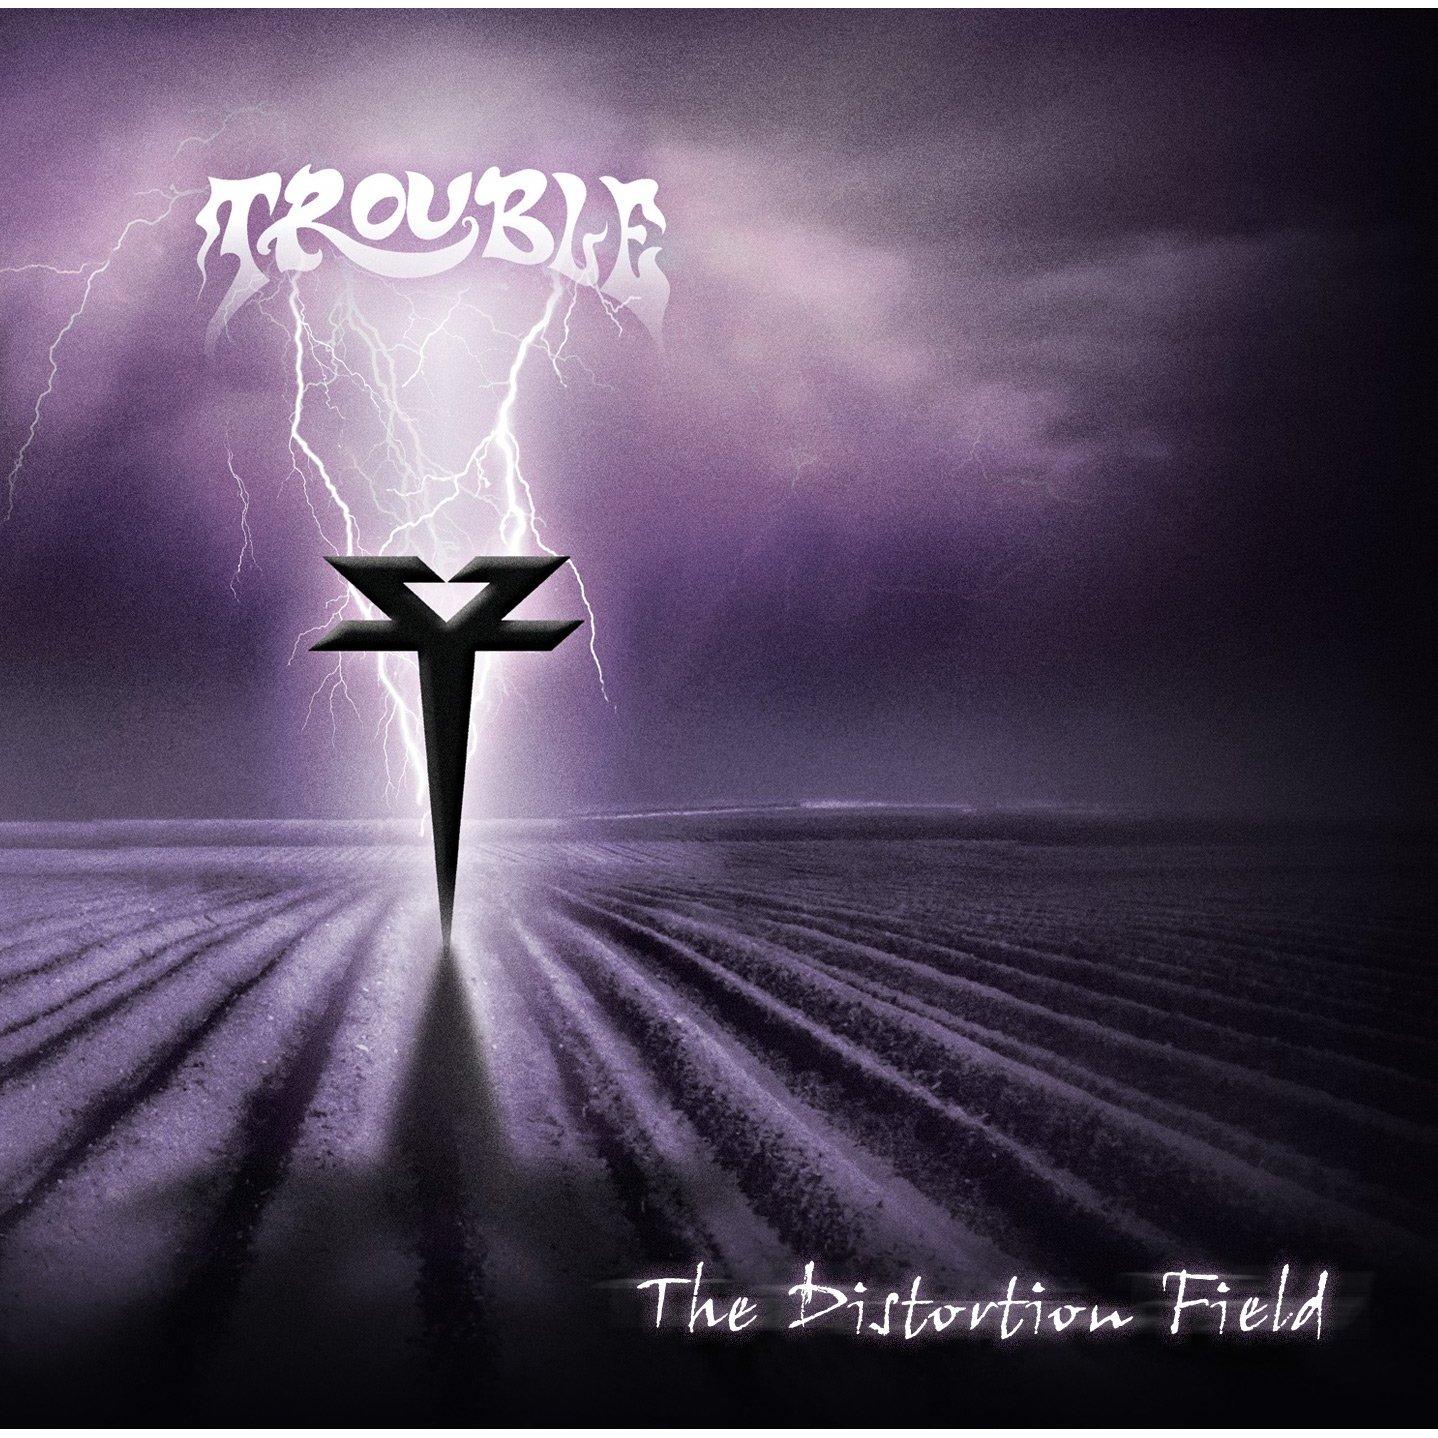 Troubleの新譜The Distortion Field_c0206645_23222265.jpg